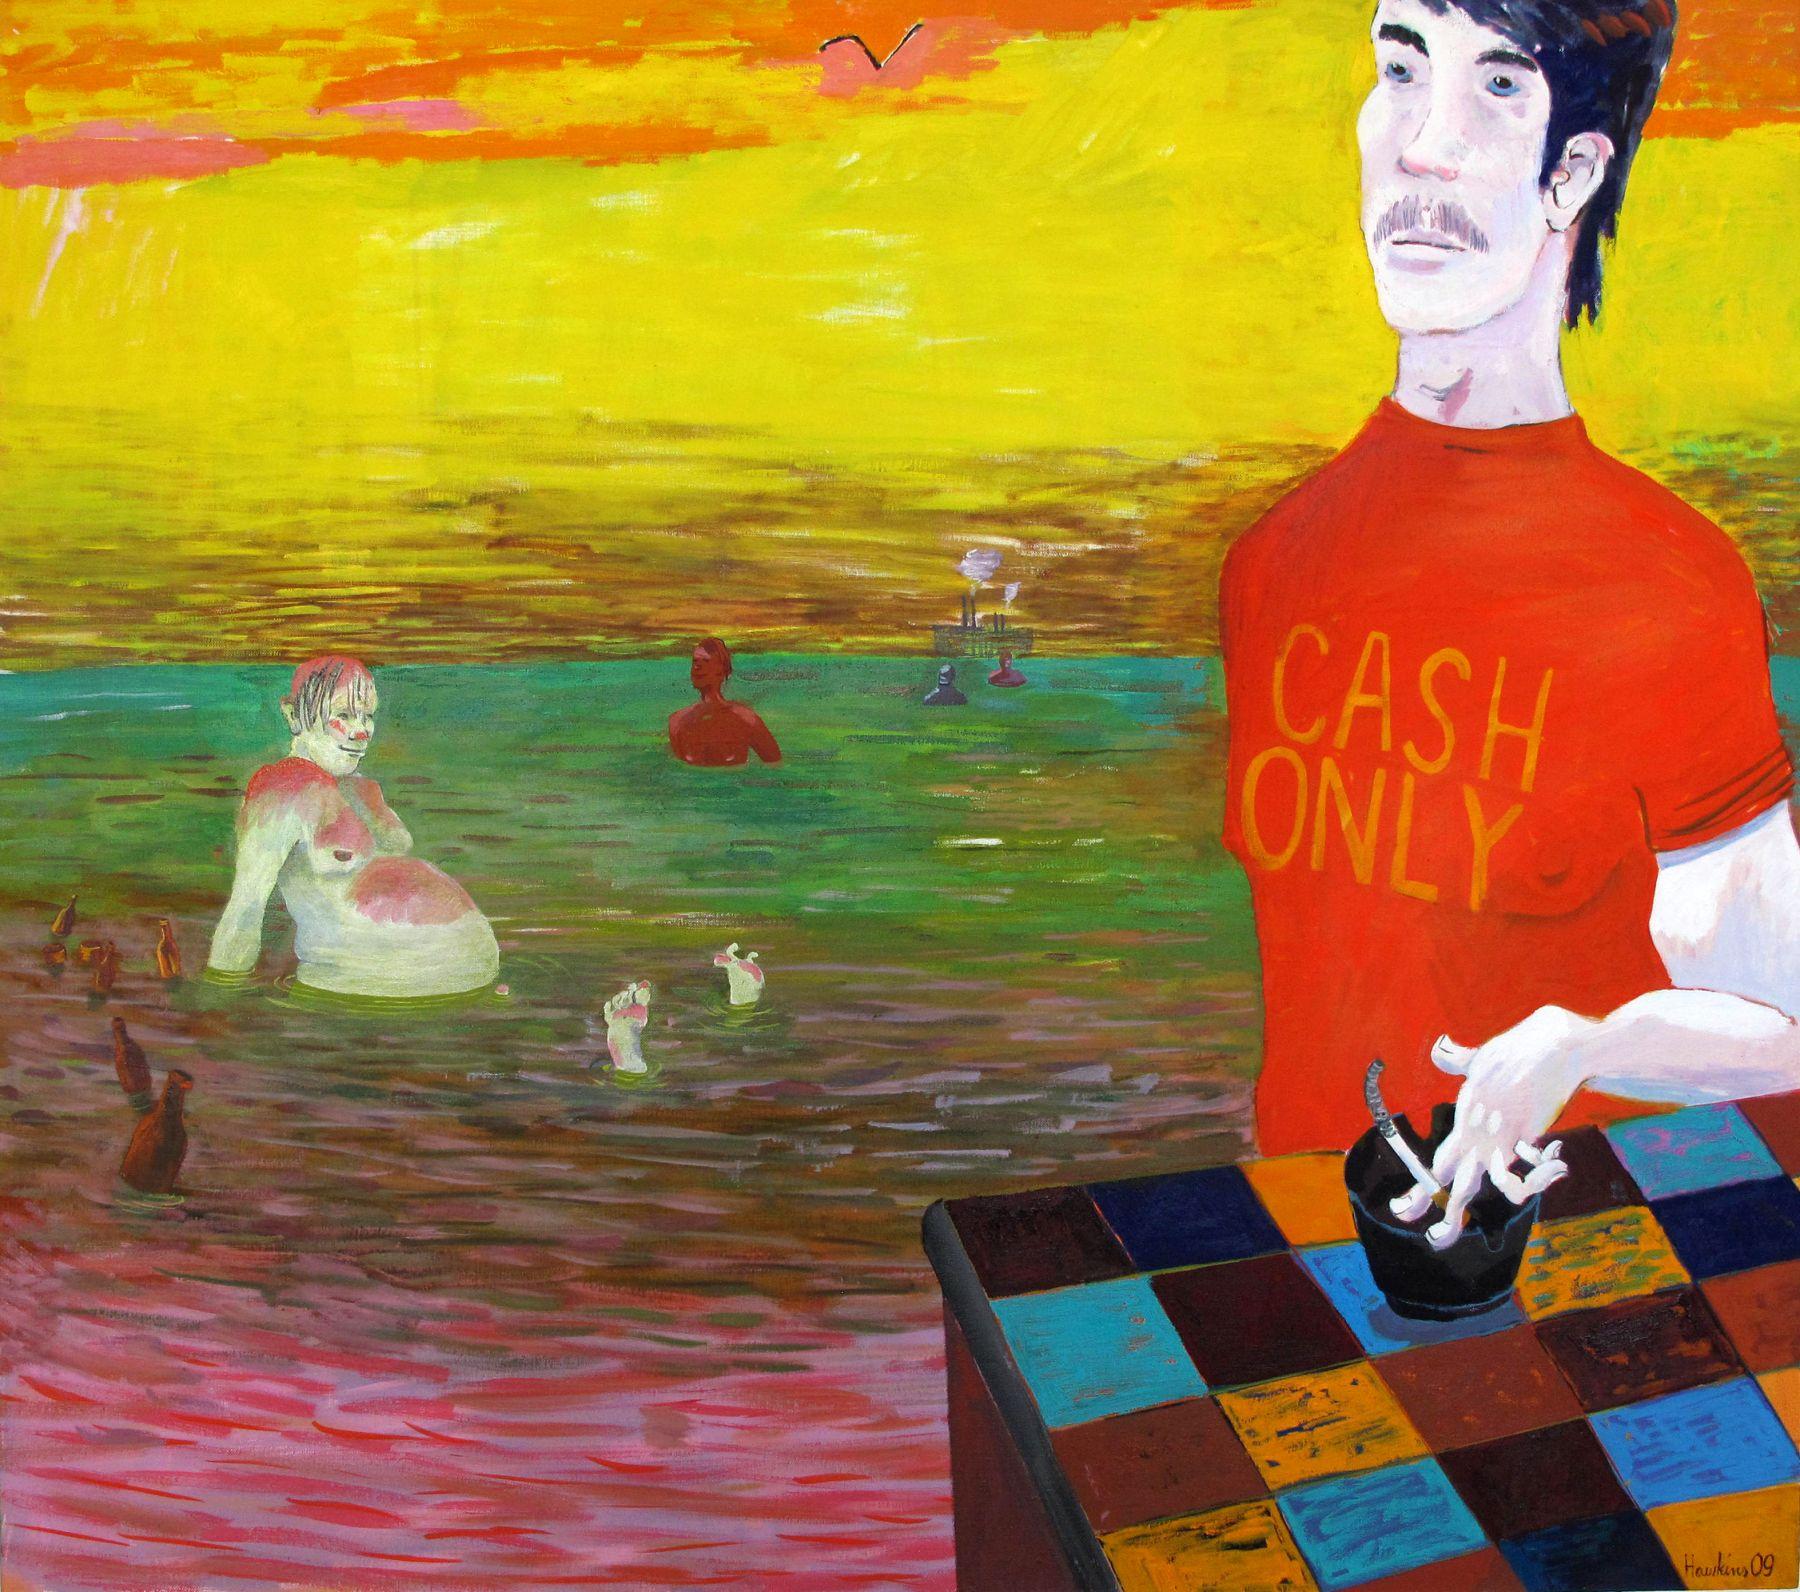 Richard Hawkins Seamonster, 2009 oil on linen 40 x 45 inches (101.6 x 114.3 cm)